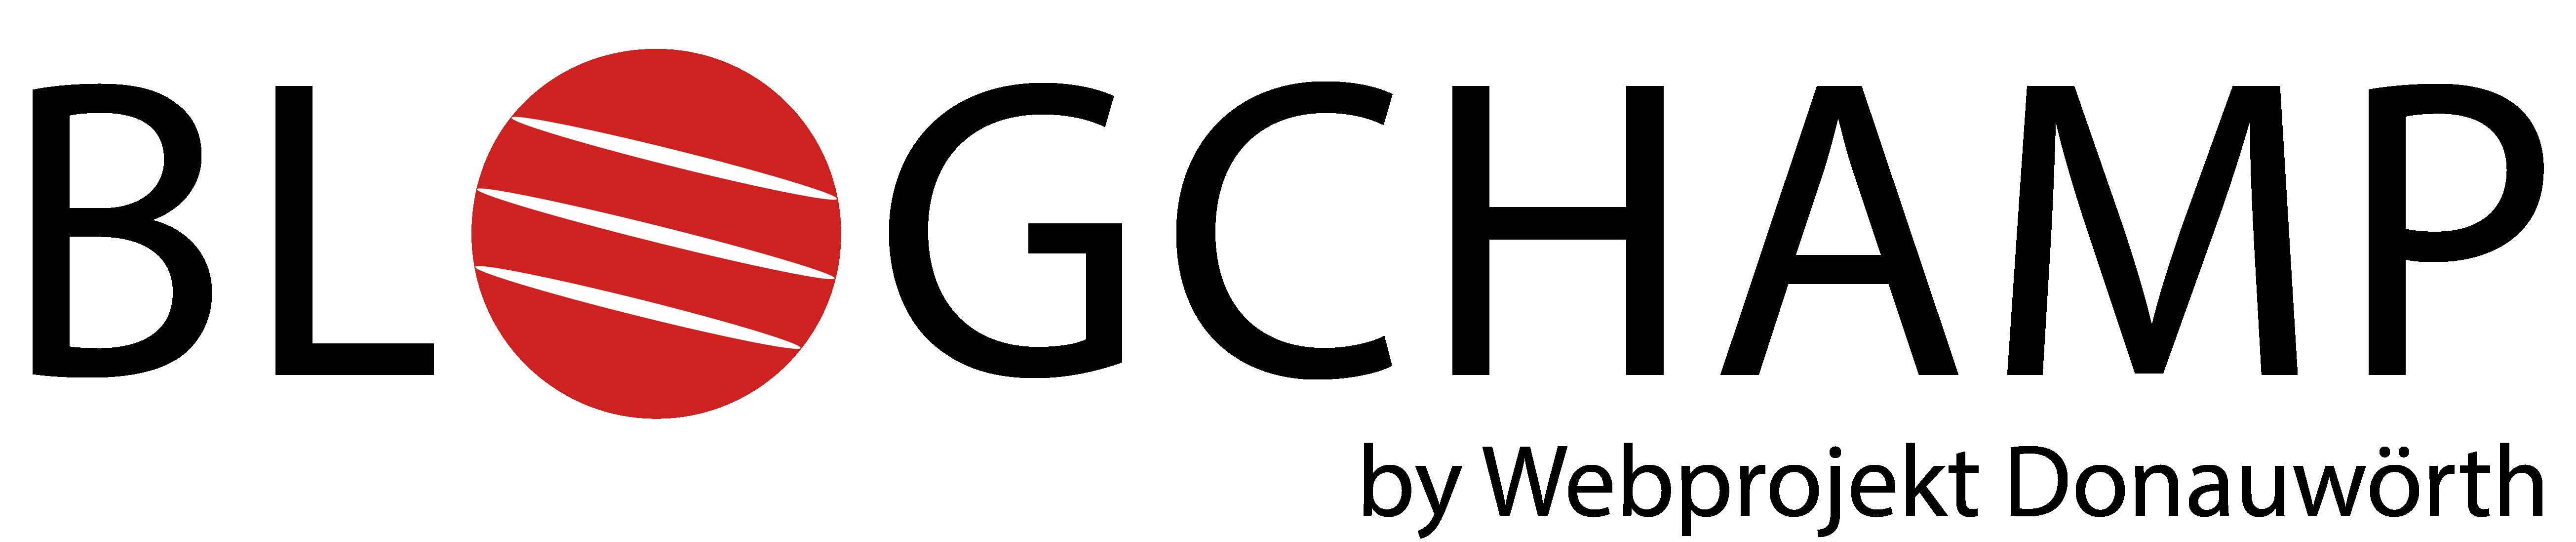 BLOGCHAMP